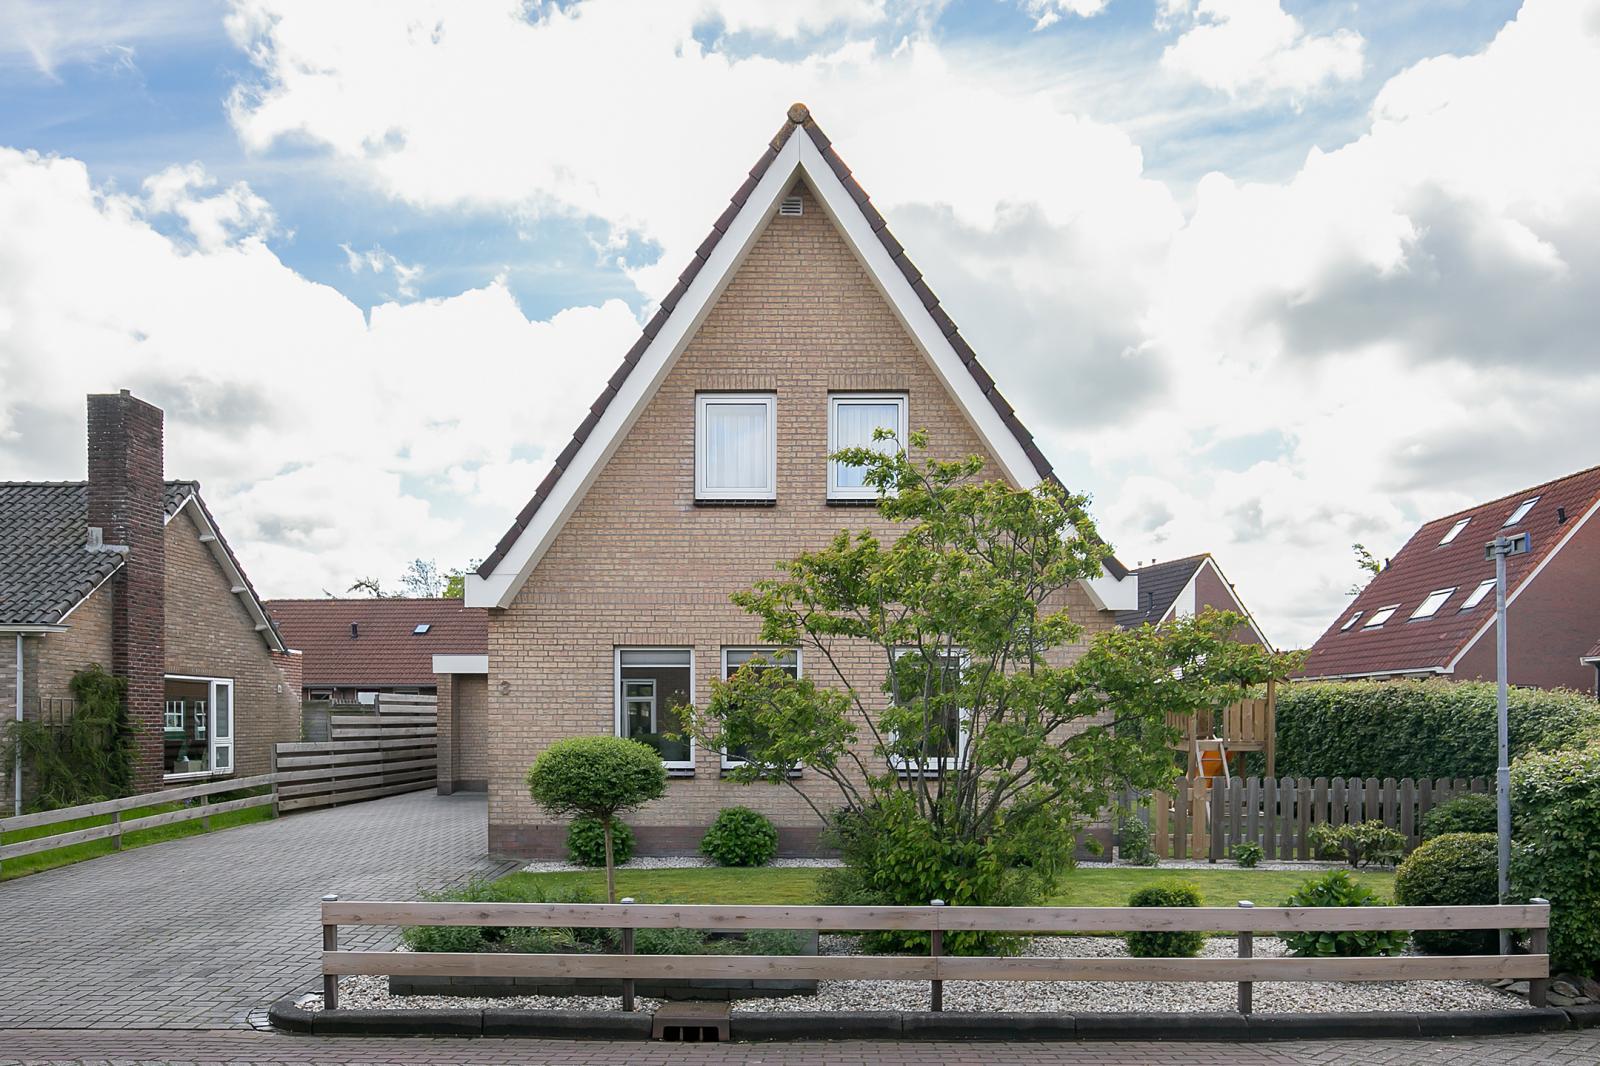 rinnert-anemastraat-3-ijlst-1224